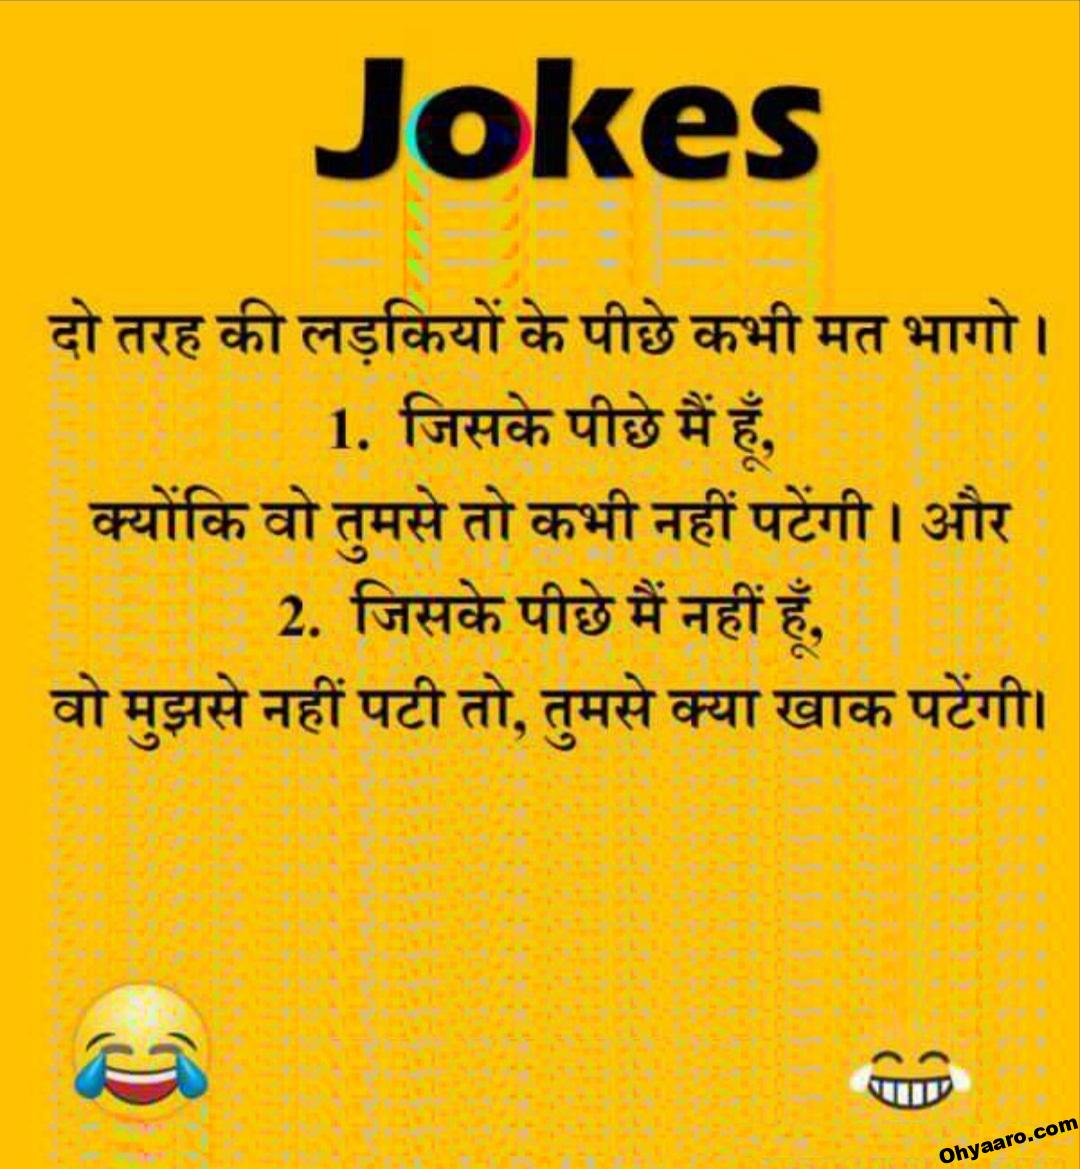 Latest WhatsApp Funny Jokes Pics